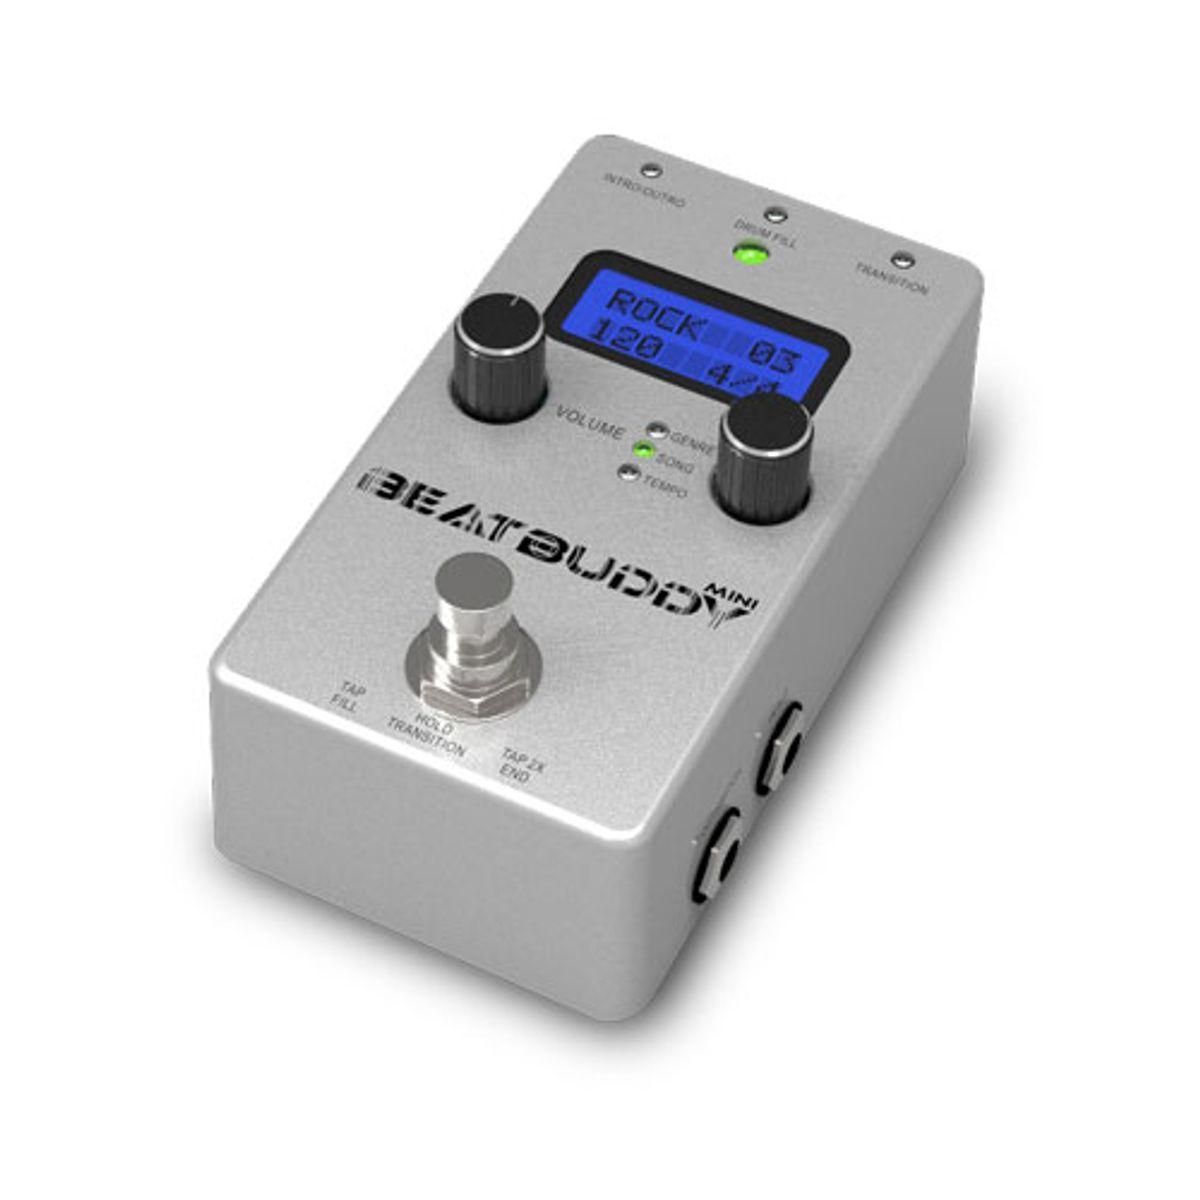 Singular Sound Announces the BeatBuddy Mini